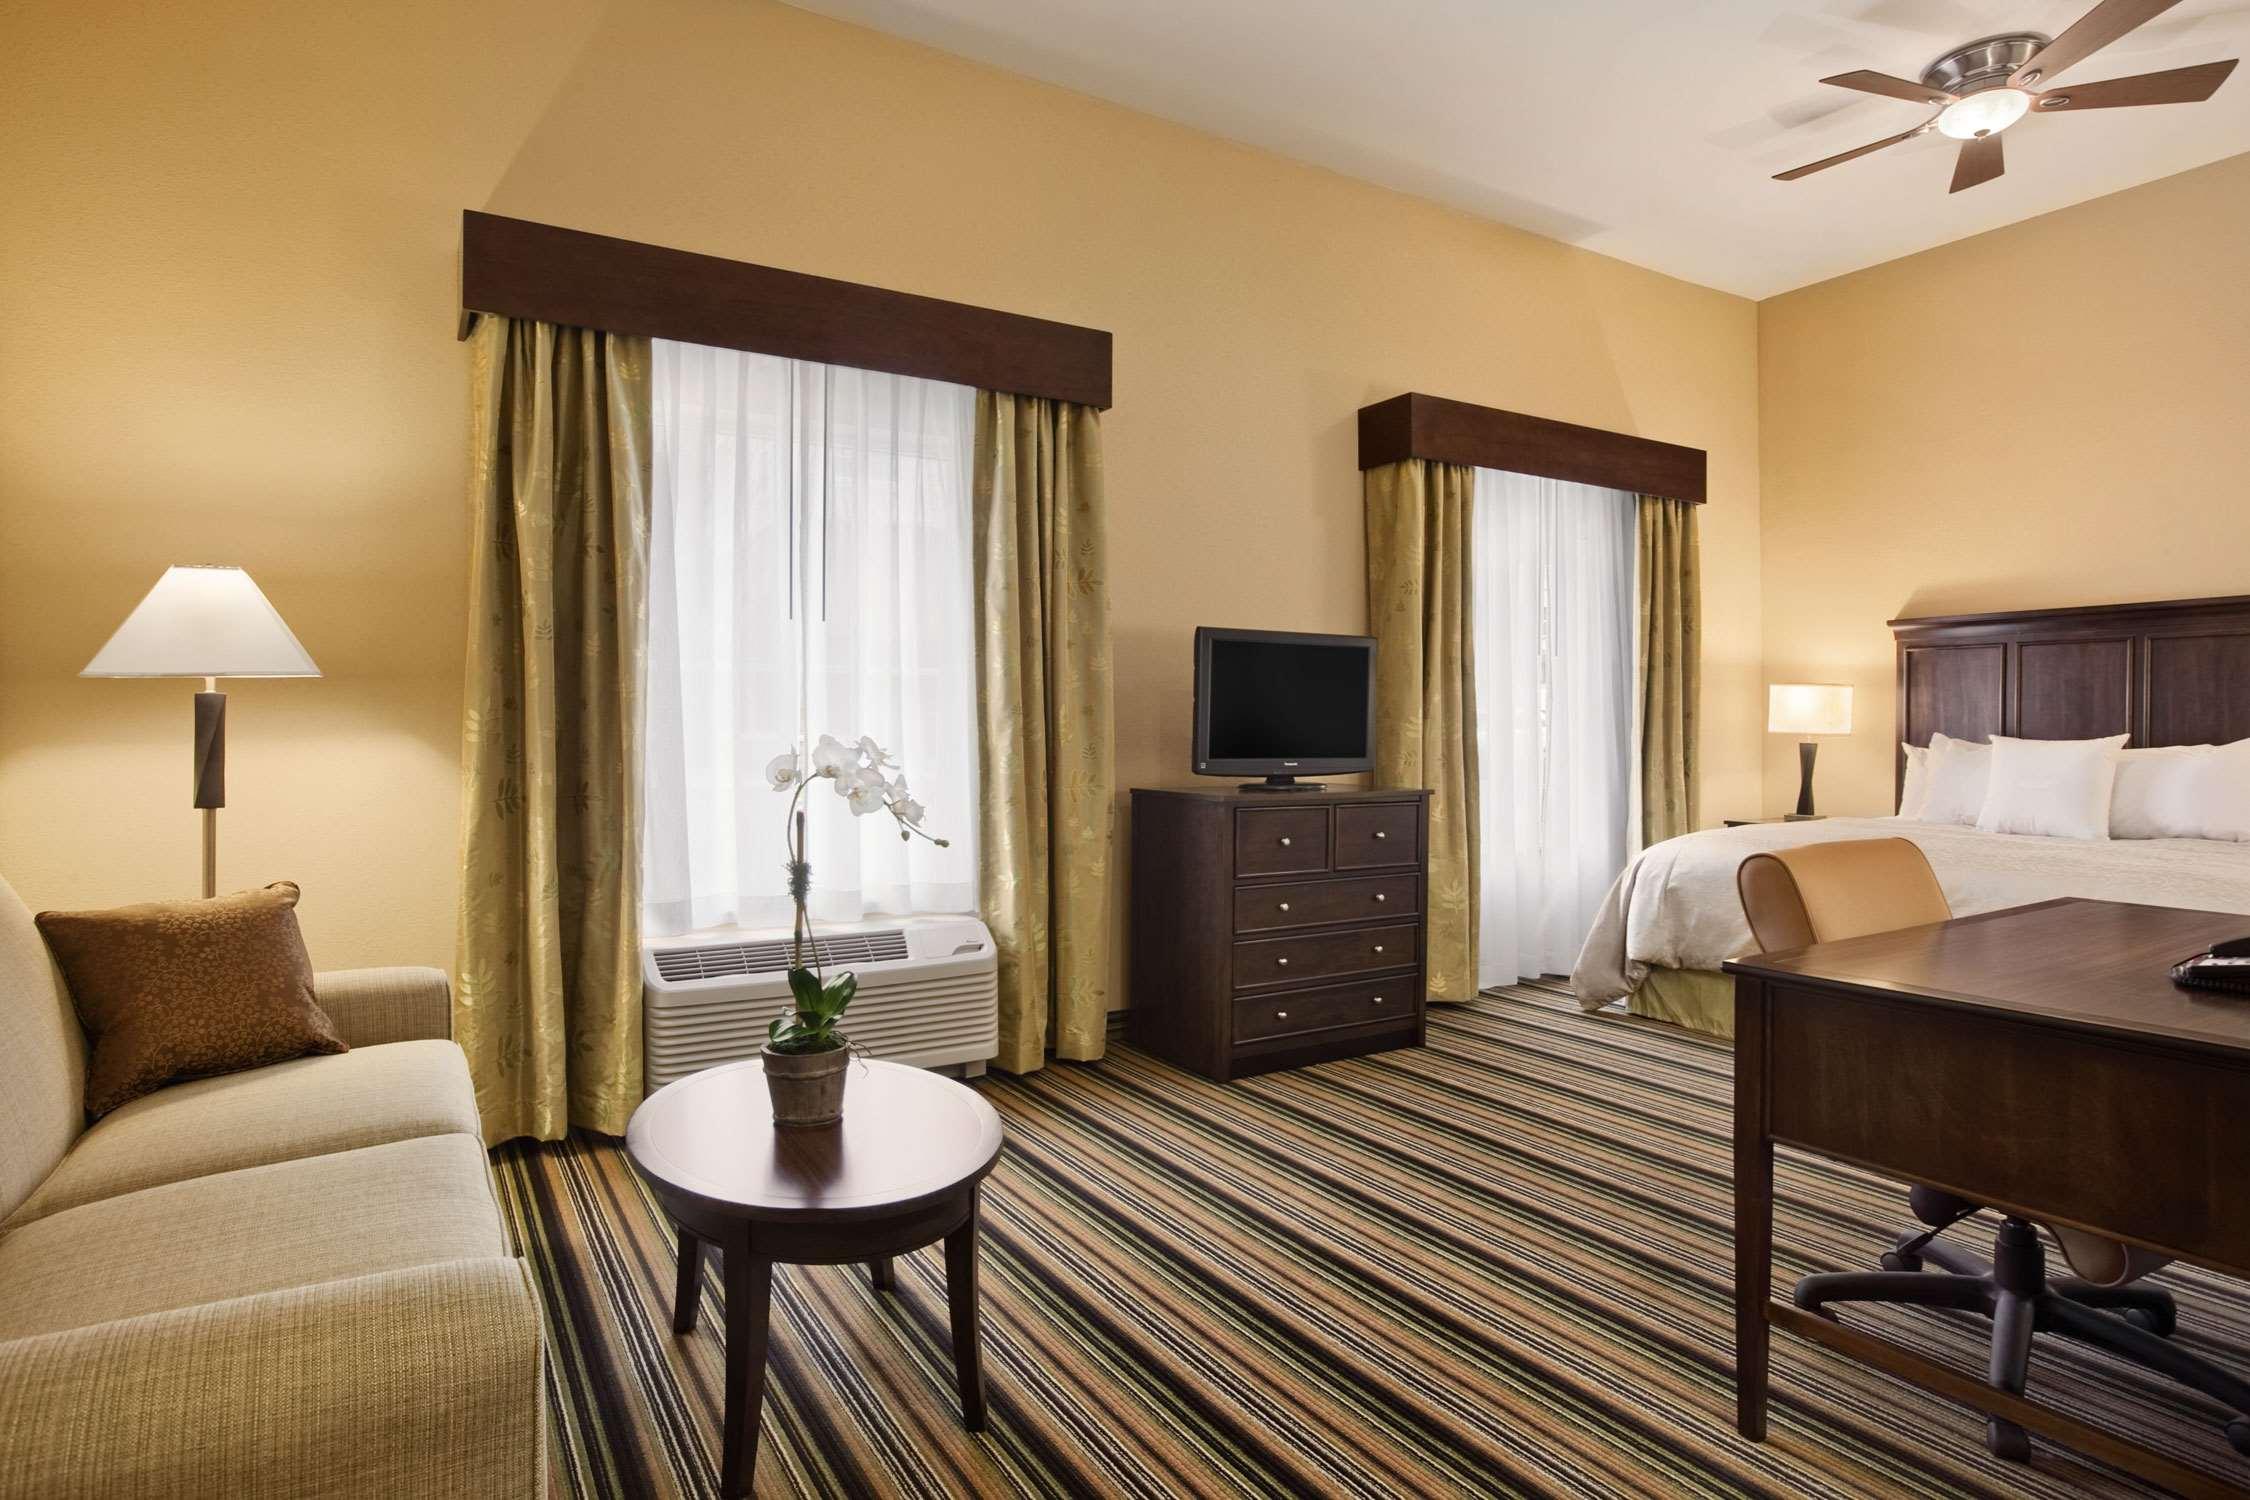 Homewood Suites by Hilton Charlotte/Ayrsley, NC image 13